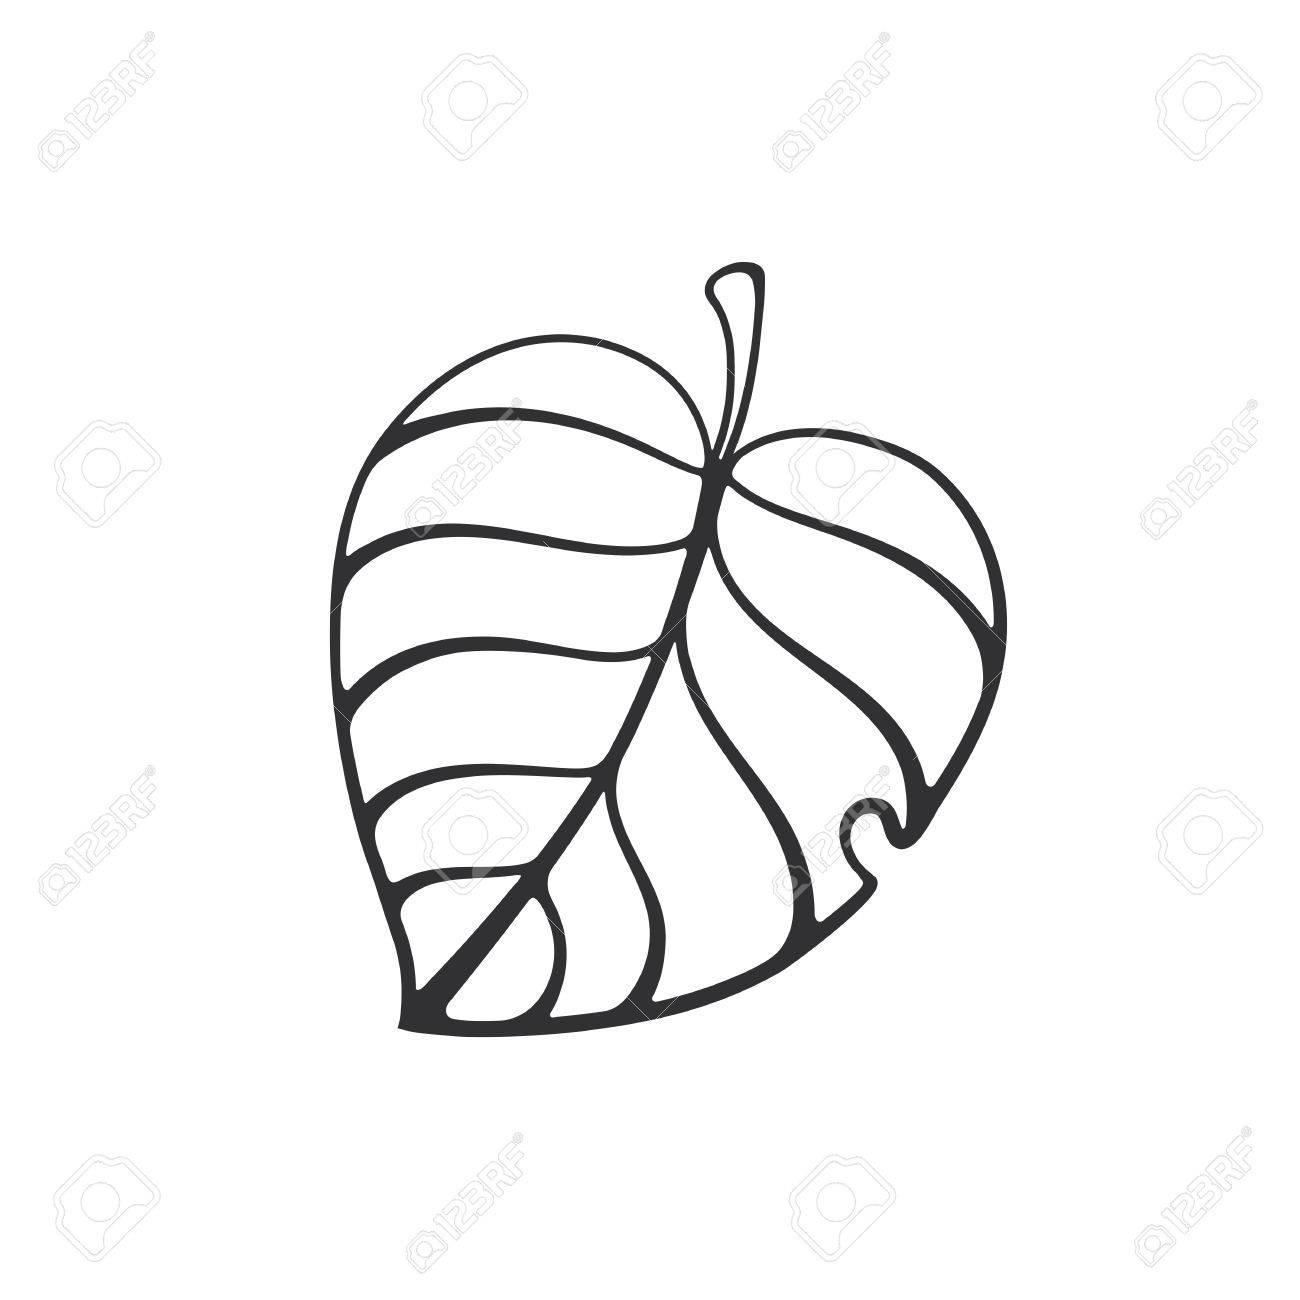 1300x1300 Vector Illustration. Cartoon Sketch Of Tree Leaf. Ecology